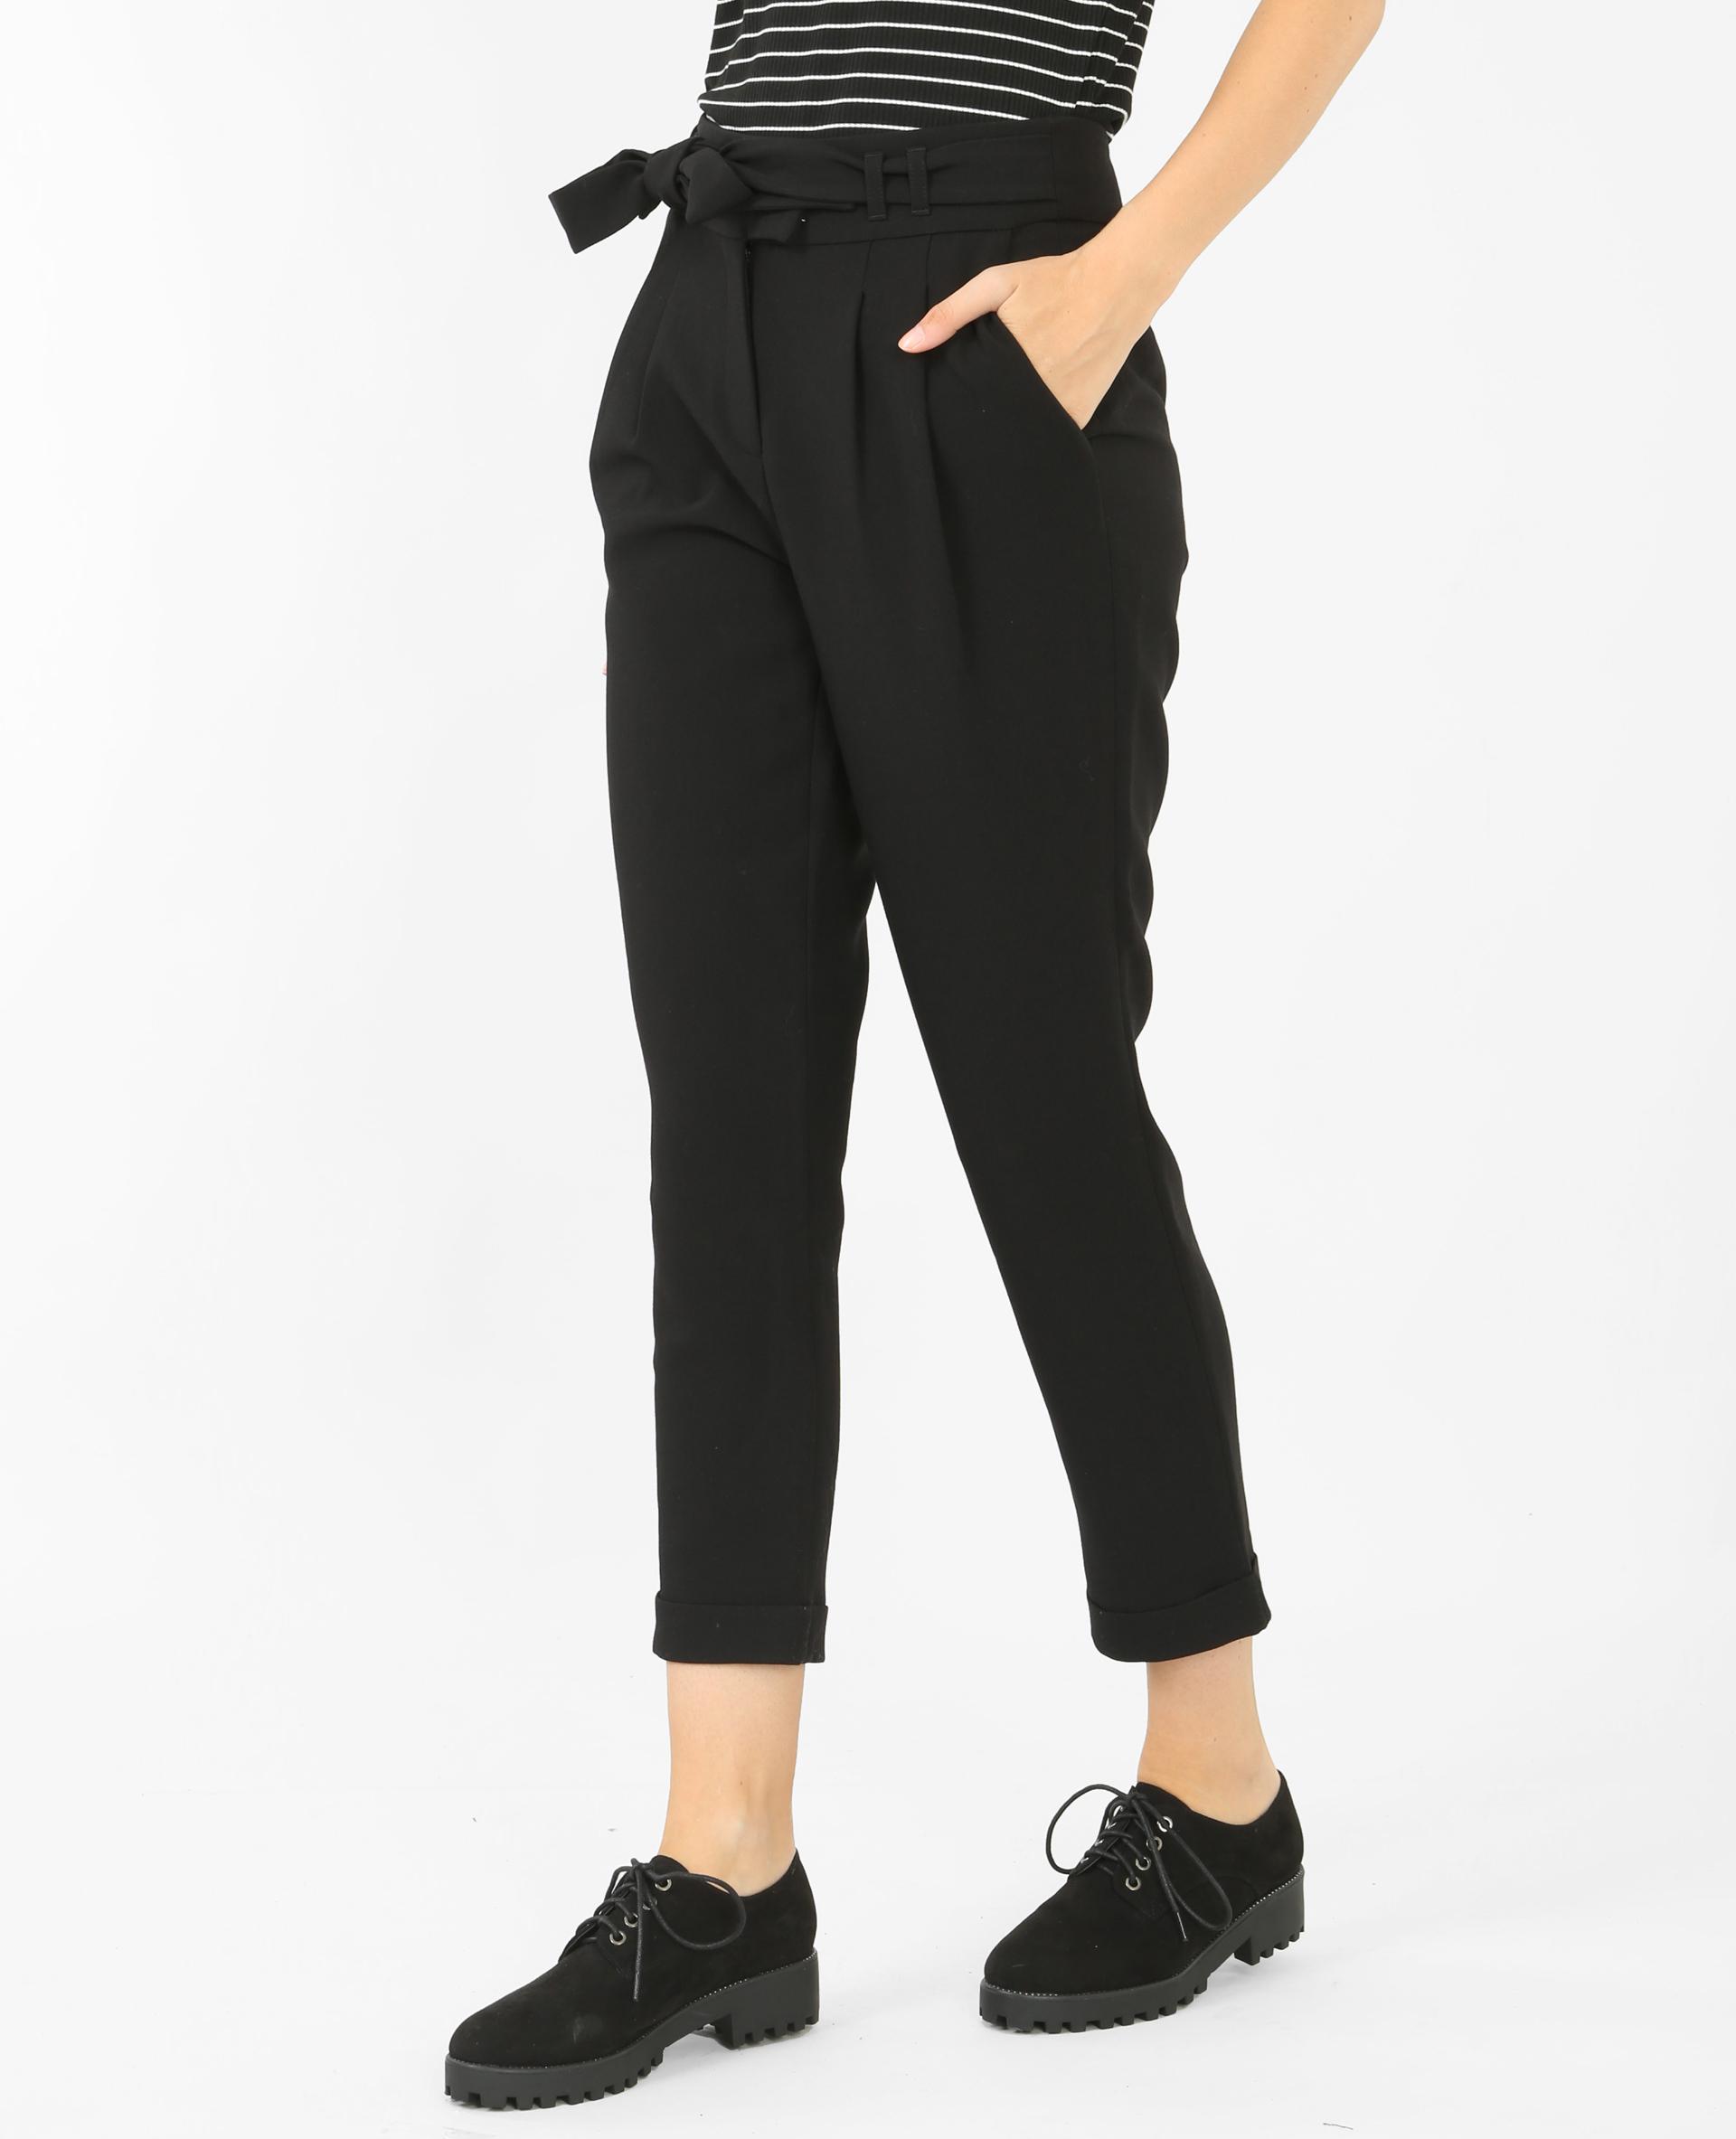 pantalon carrot noir 145166899a08 pimkie. Black Bedroom Furniture Sets. Home Design Ideas